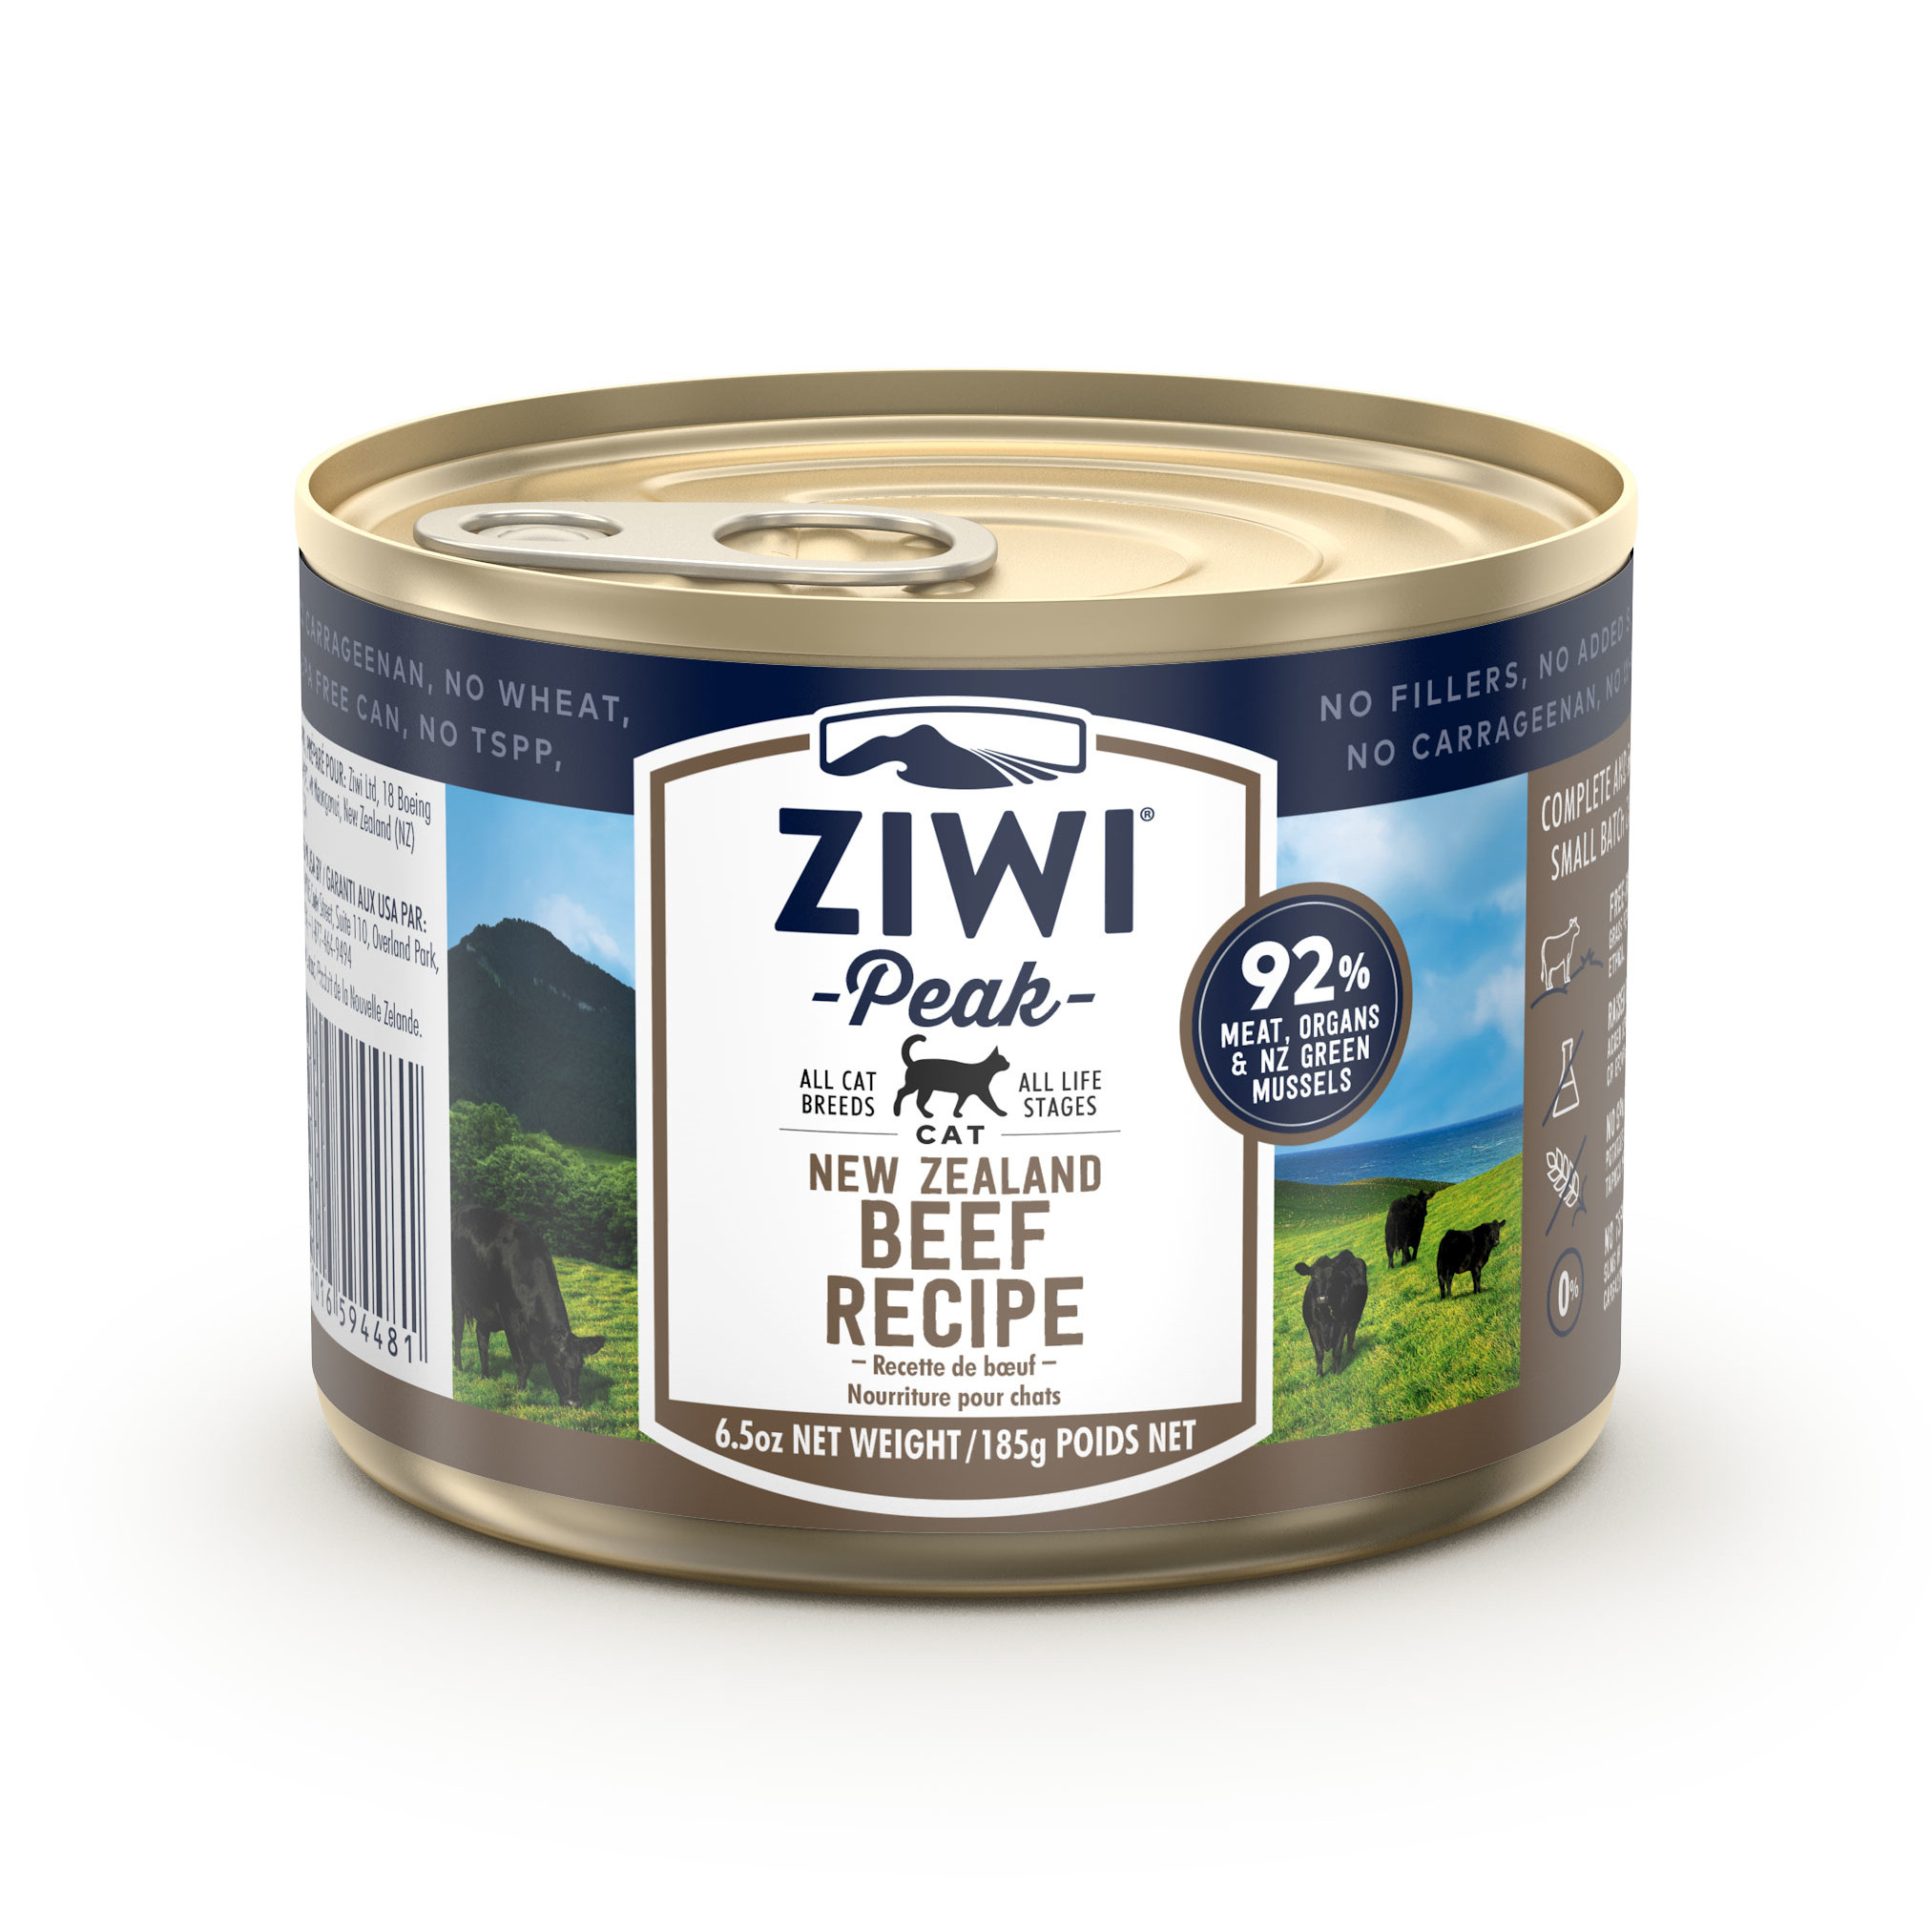 ZIWI Peak Canned Cat Food Beef Recipe, 6.5-oz|185-g (case of 12)